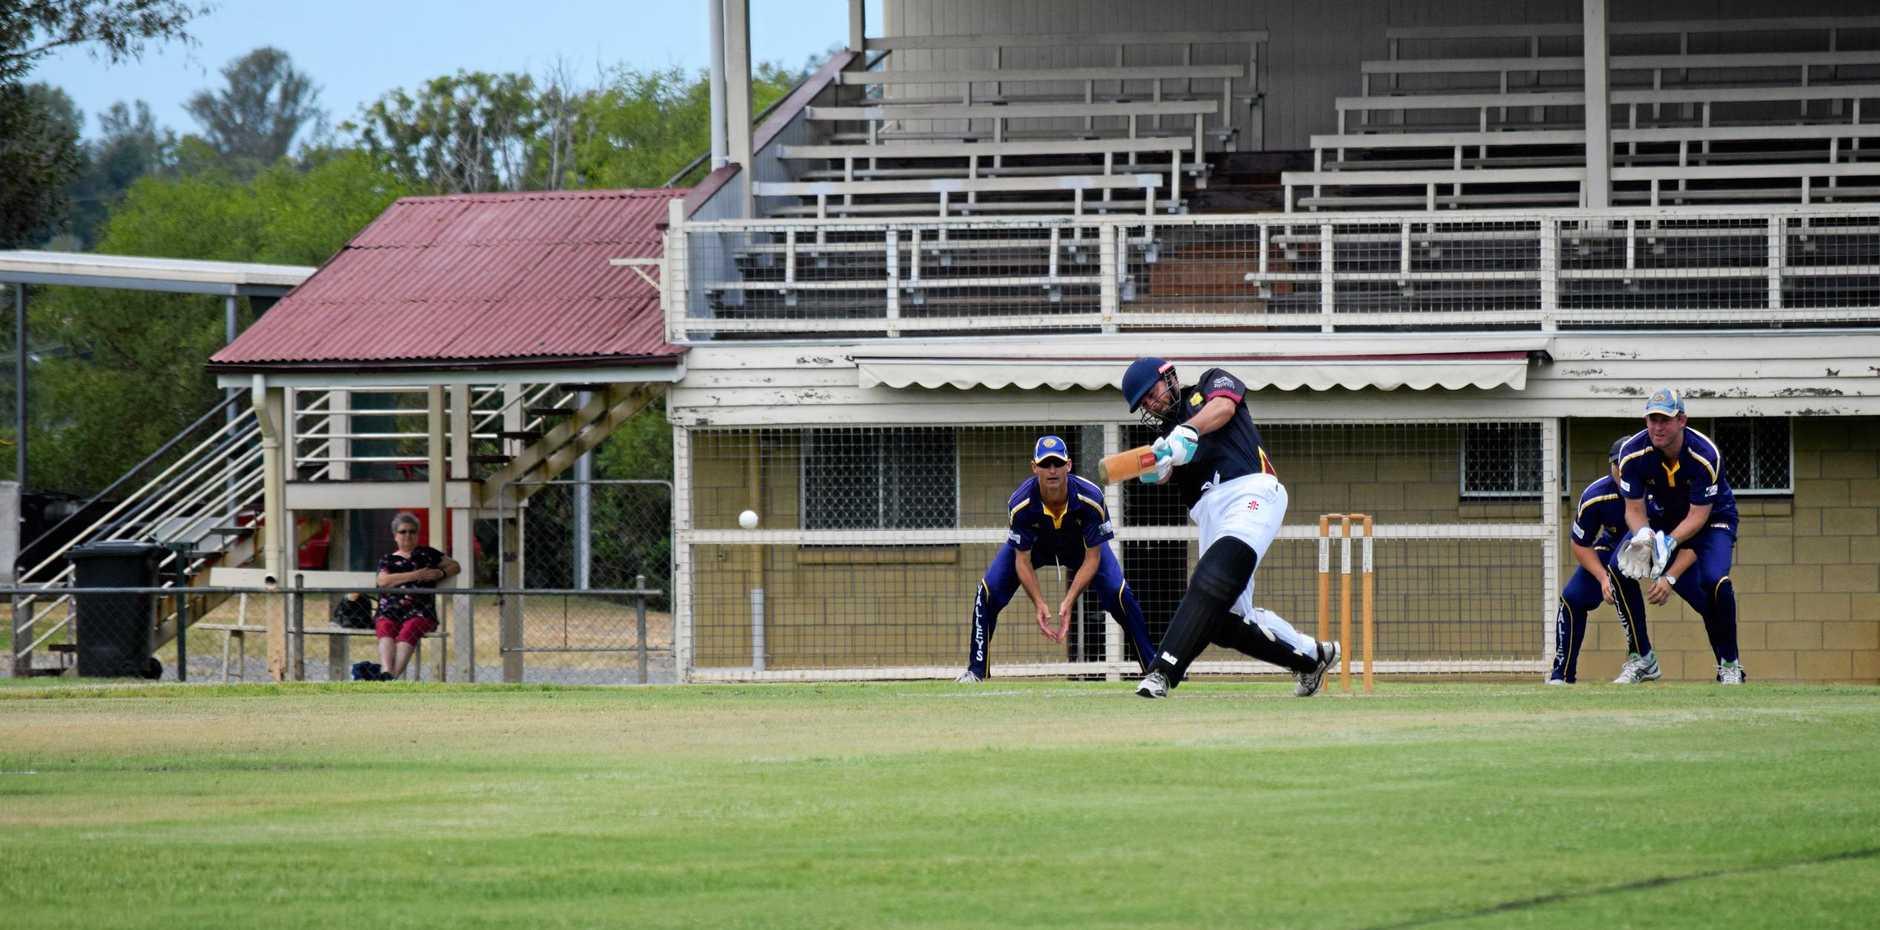 Cricket Photo's - Harlequin's player, Todd Keogh